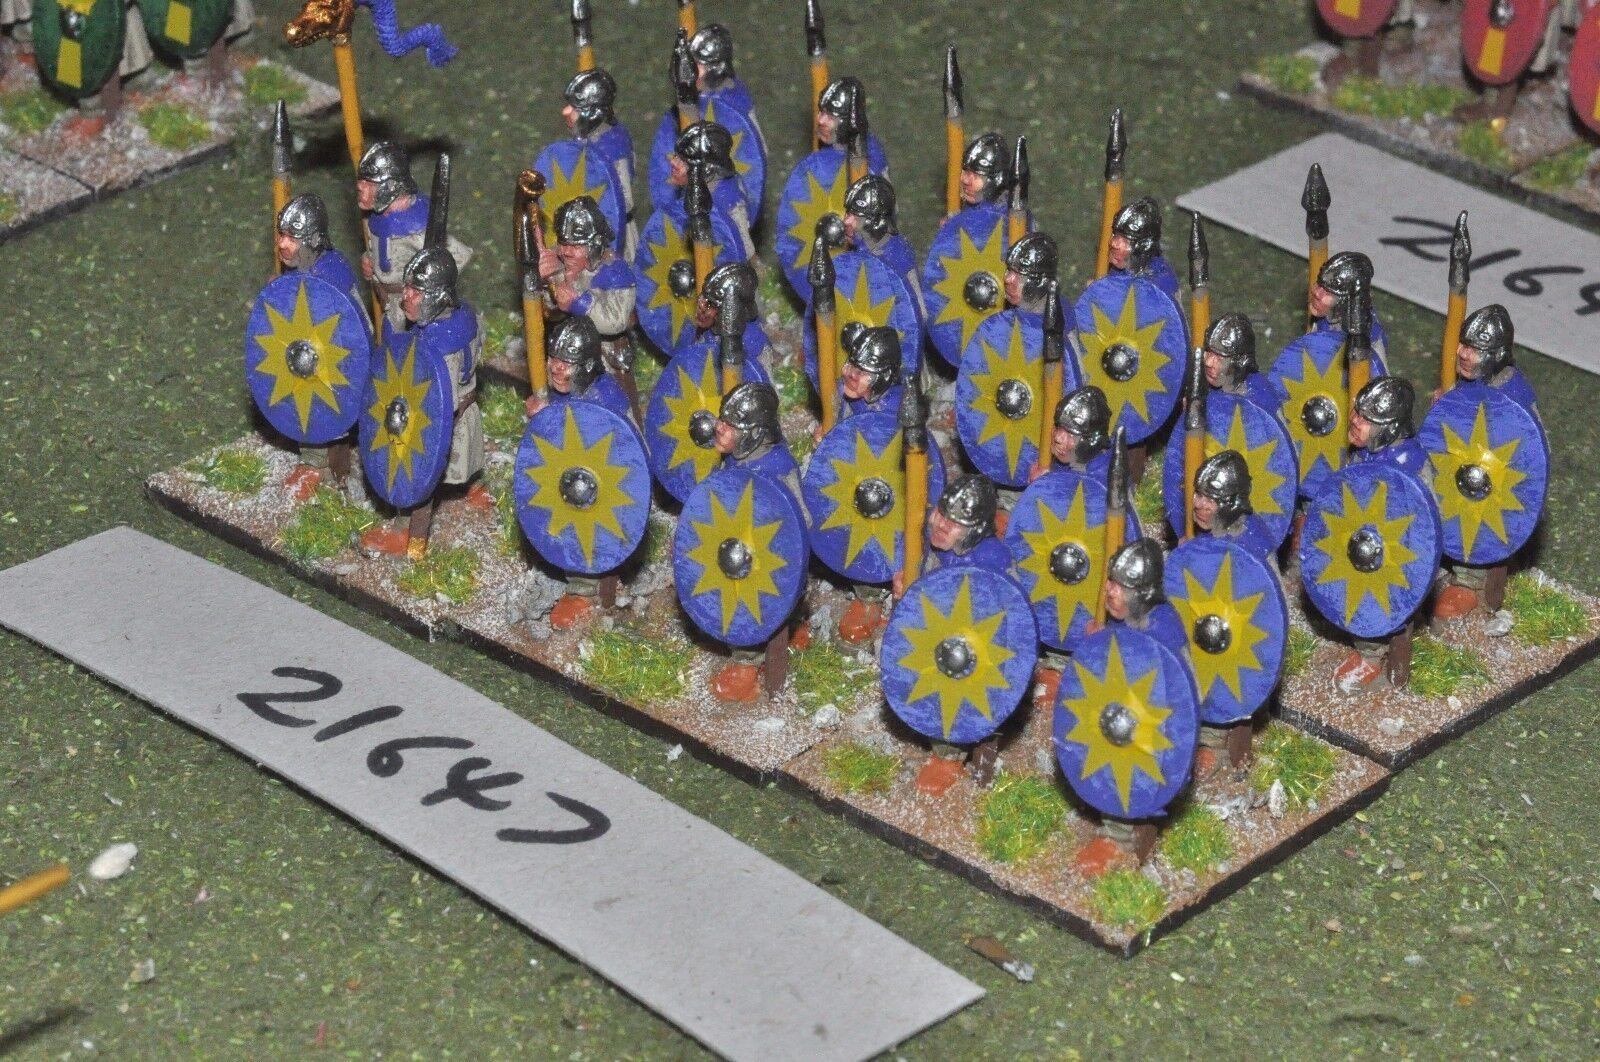 100% garantía genuina de contador 25mm época época época Romana Romana-legionarios 24 higos Infantería-INF (21647)  Garantía 100% de ajuste